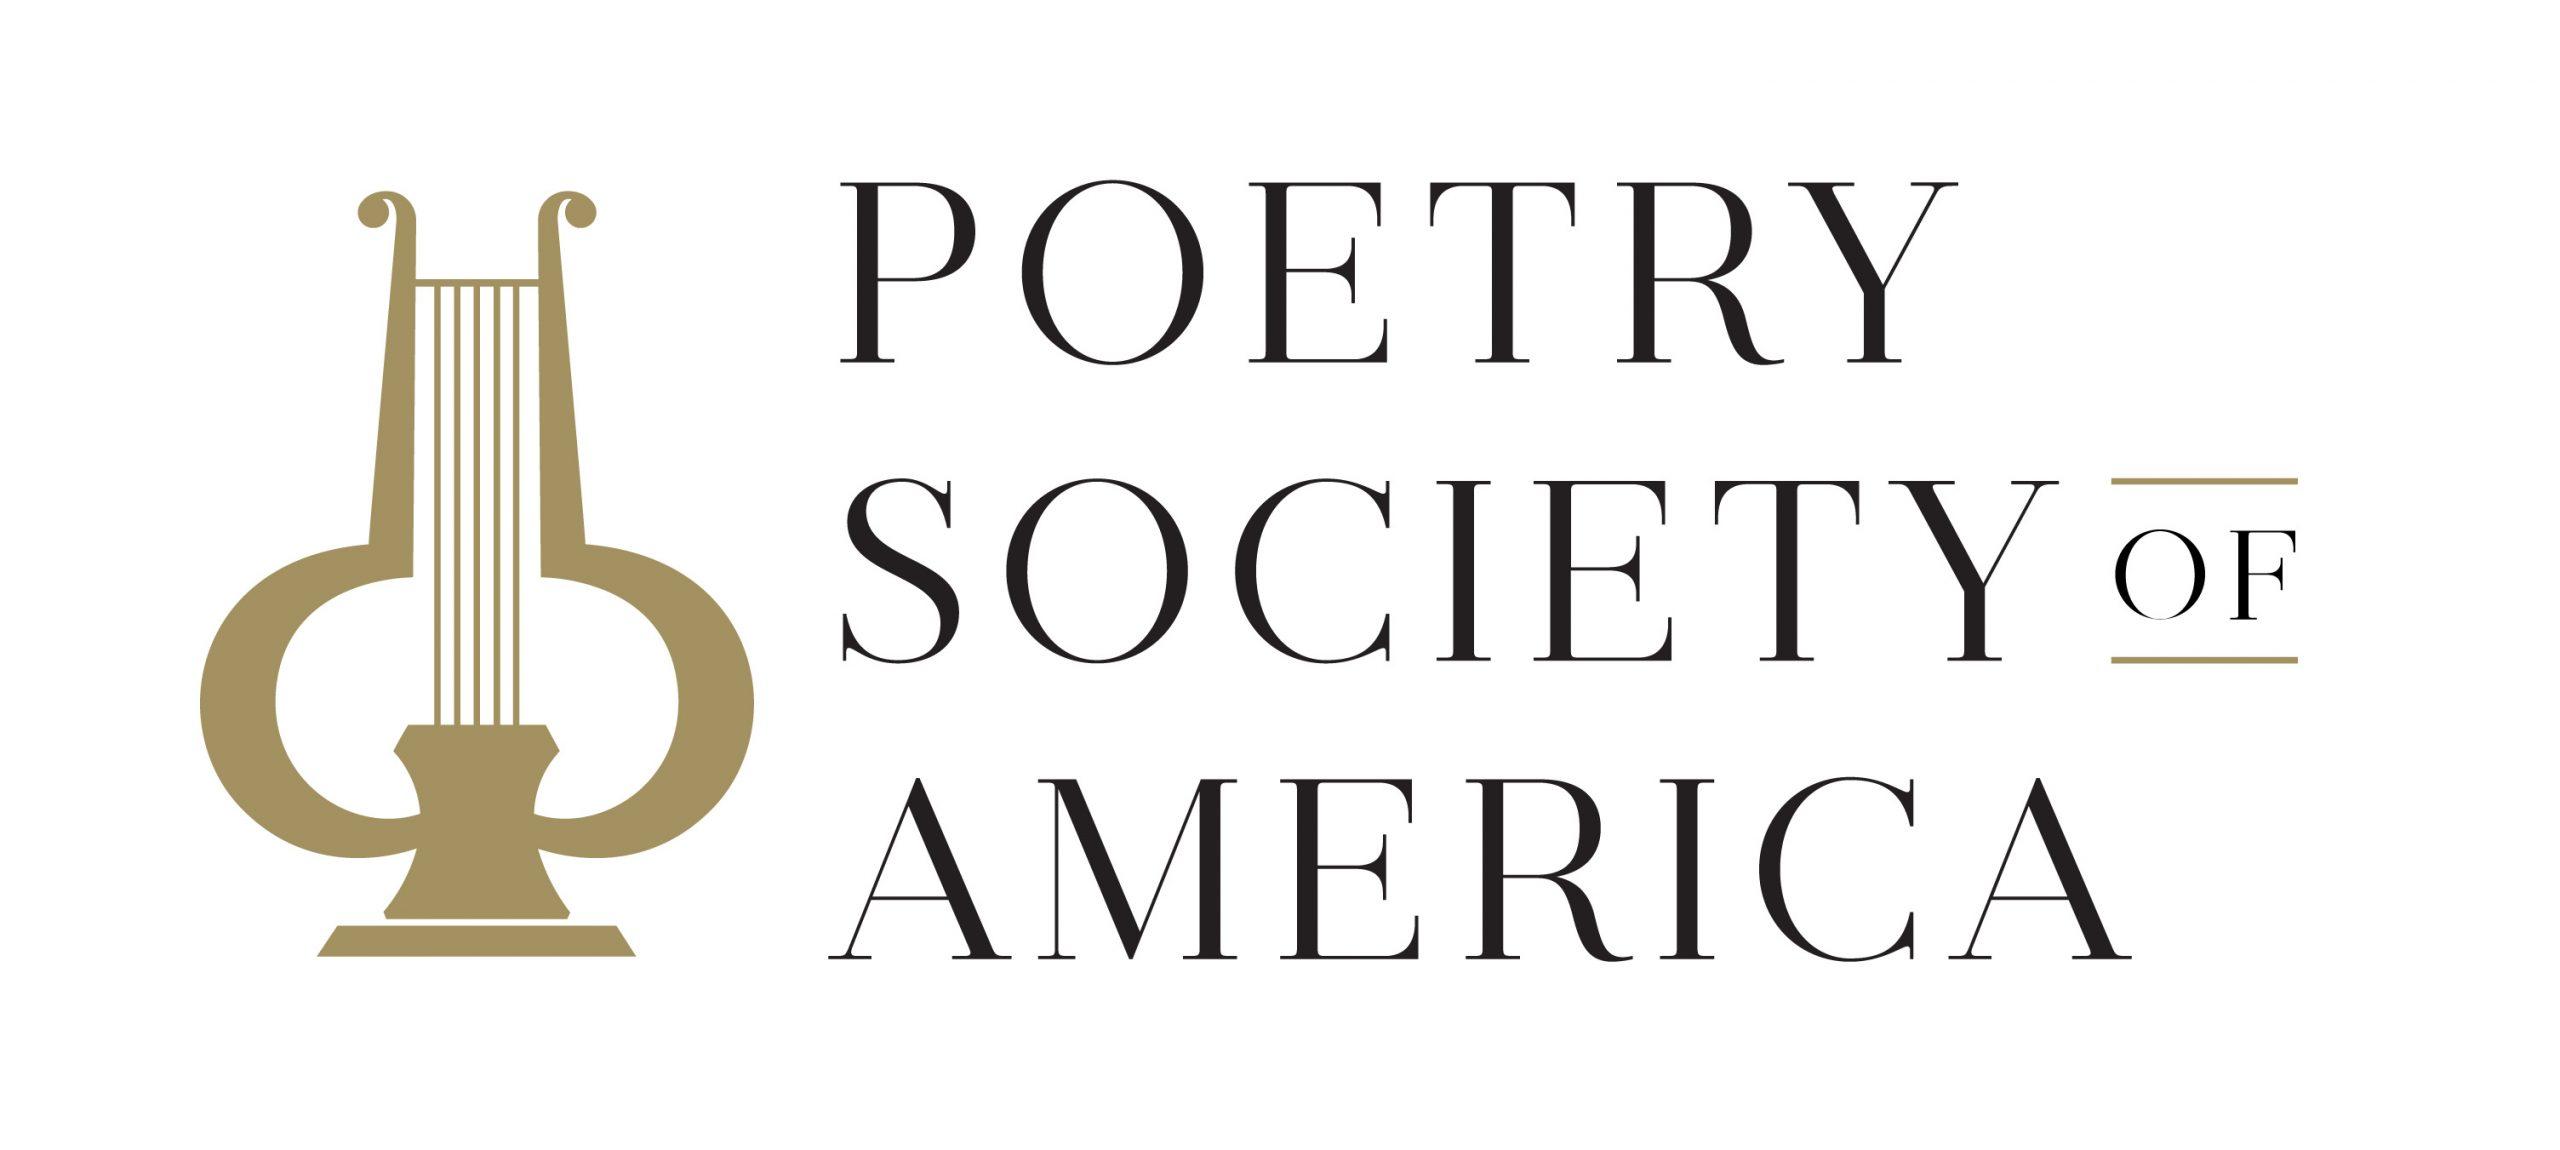 Poetry Society of America